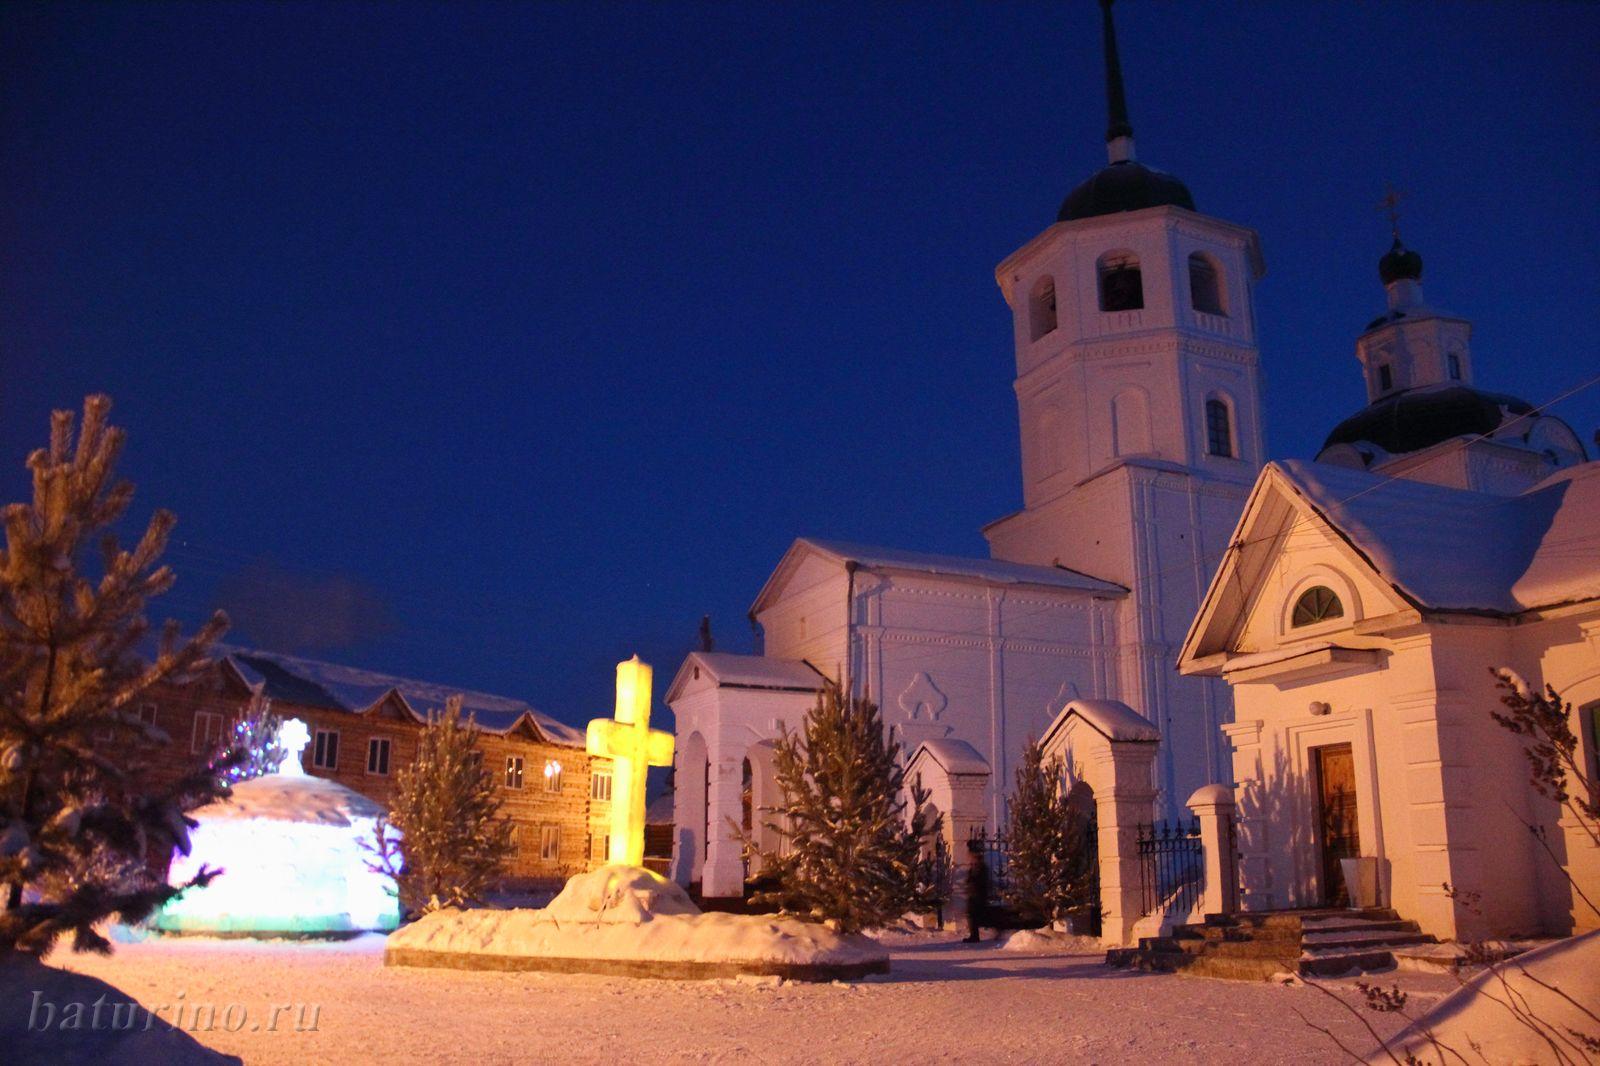 bogoiavlenie-2014-09